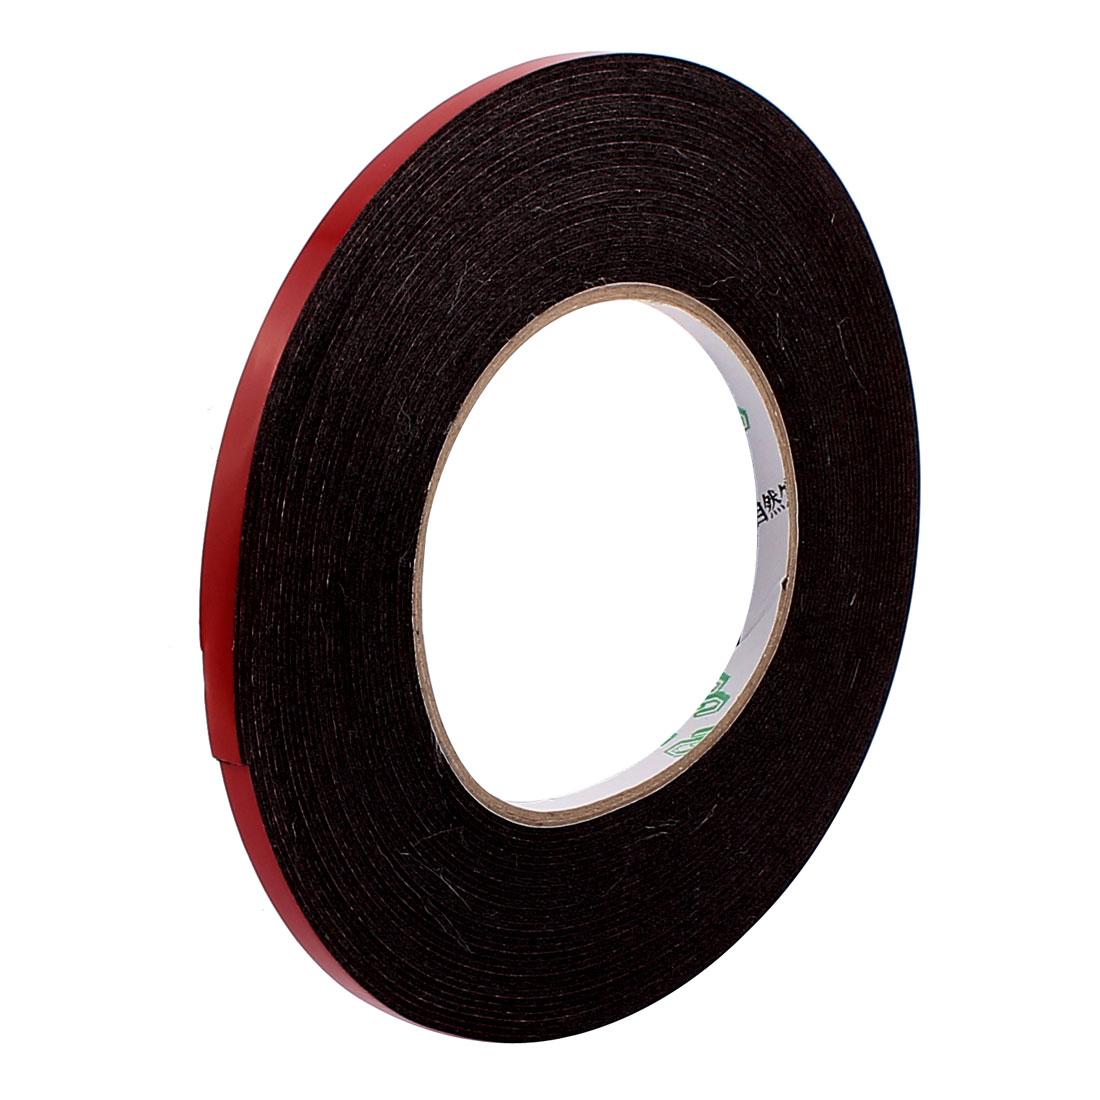 6mmx1mm Double Sided Sponge Tape Adhesive Sticker Foam Glue Strip Sealing 10 Meters 33Ft